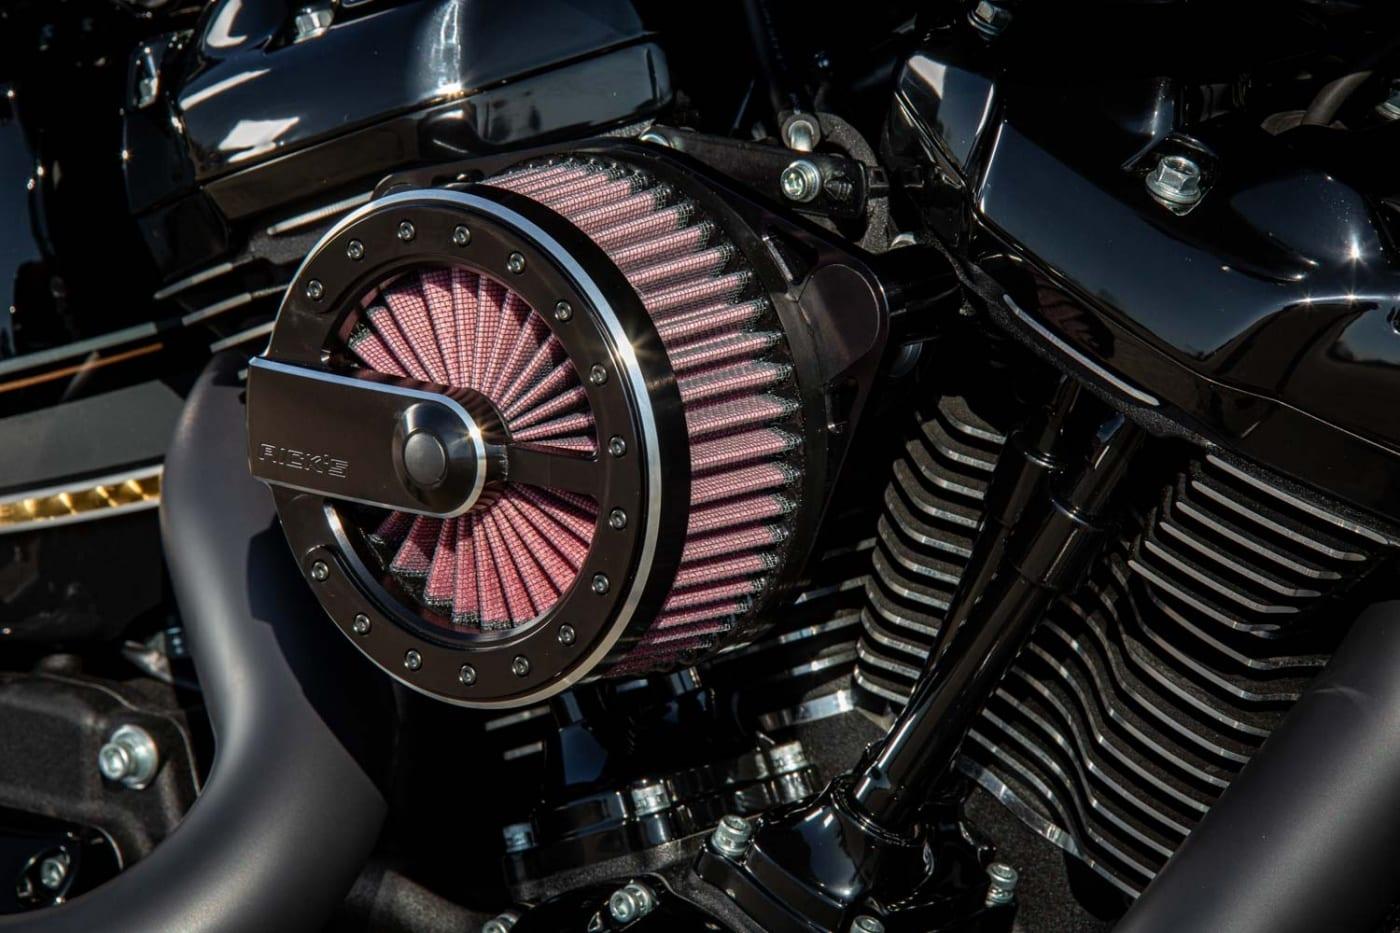 114cui Milwaukee-Eight Motor gemappt